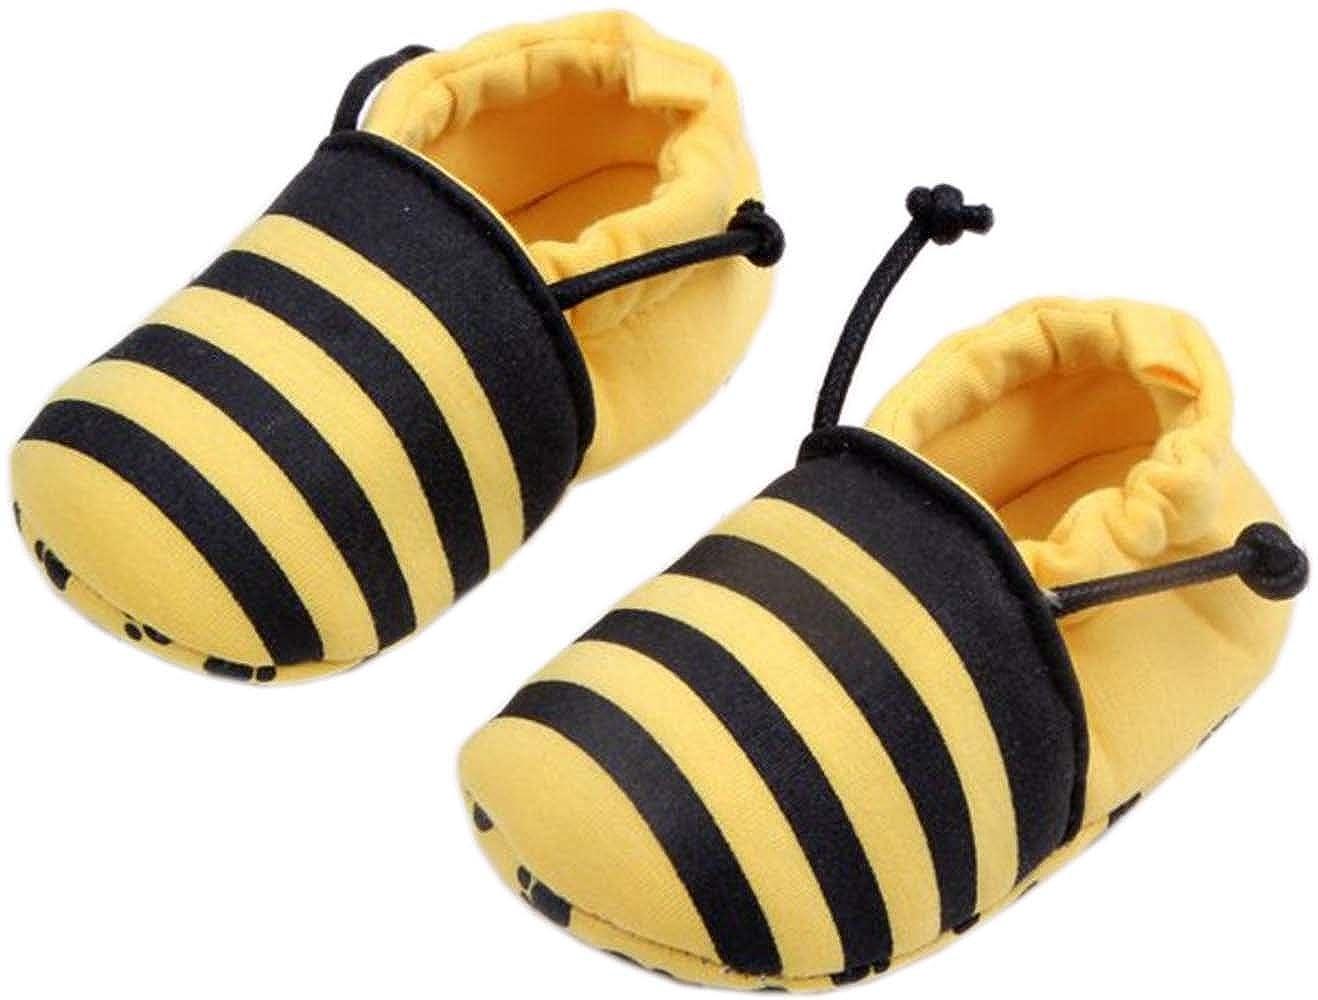 0-1 Year bettyhome Cotton Unisex Baby Newborn Bee Pattern Soft Sole Infant Toddler Prewalker Sneakers